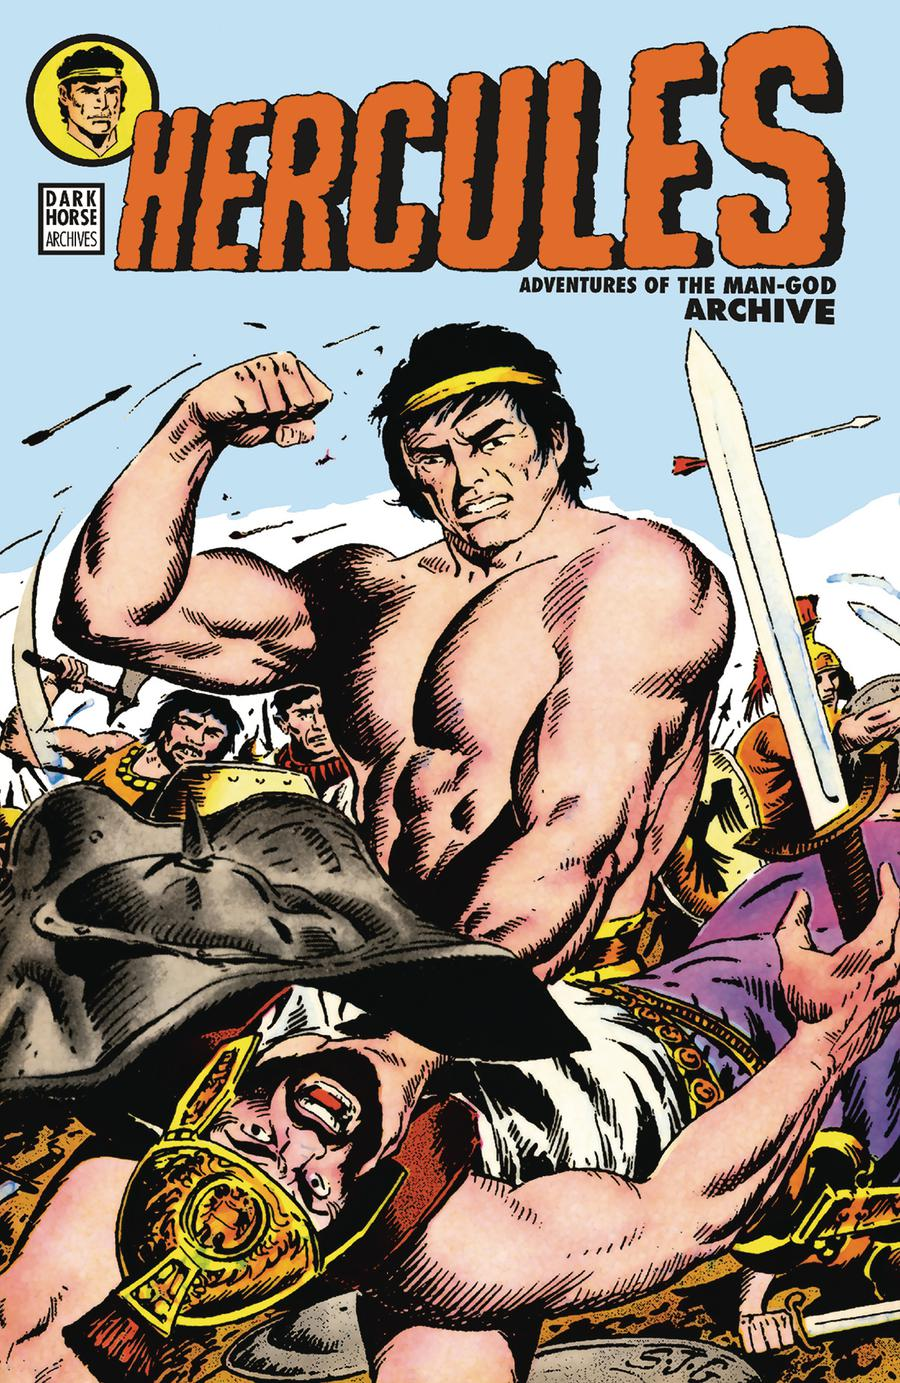 Hercules Adventures Of The Man-God Archive HC